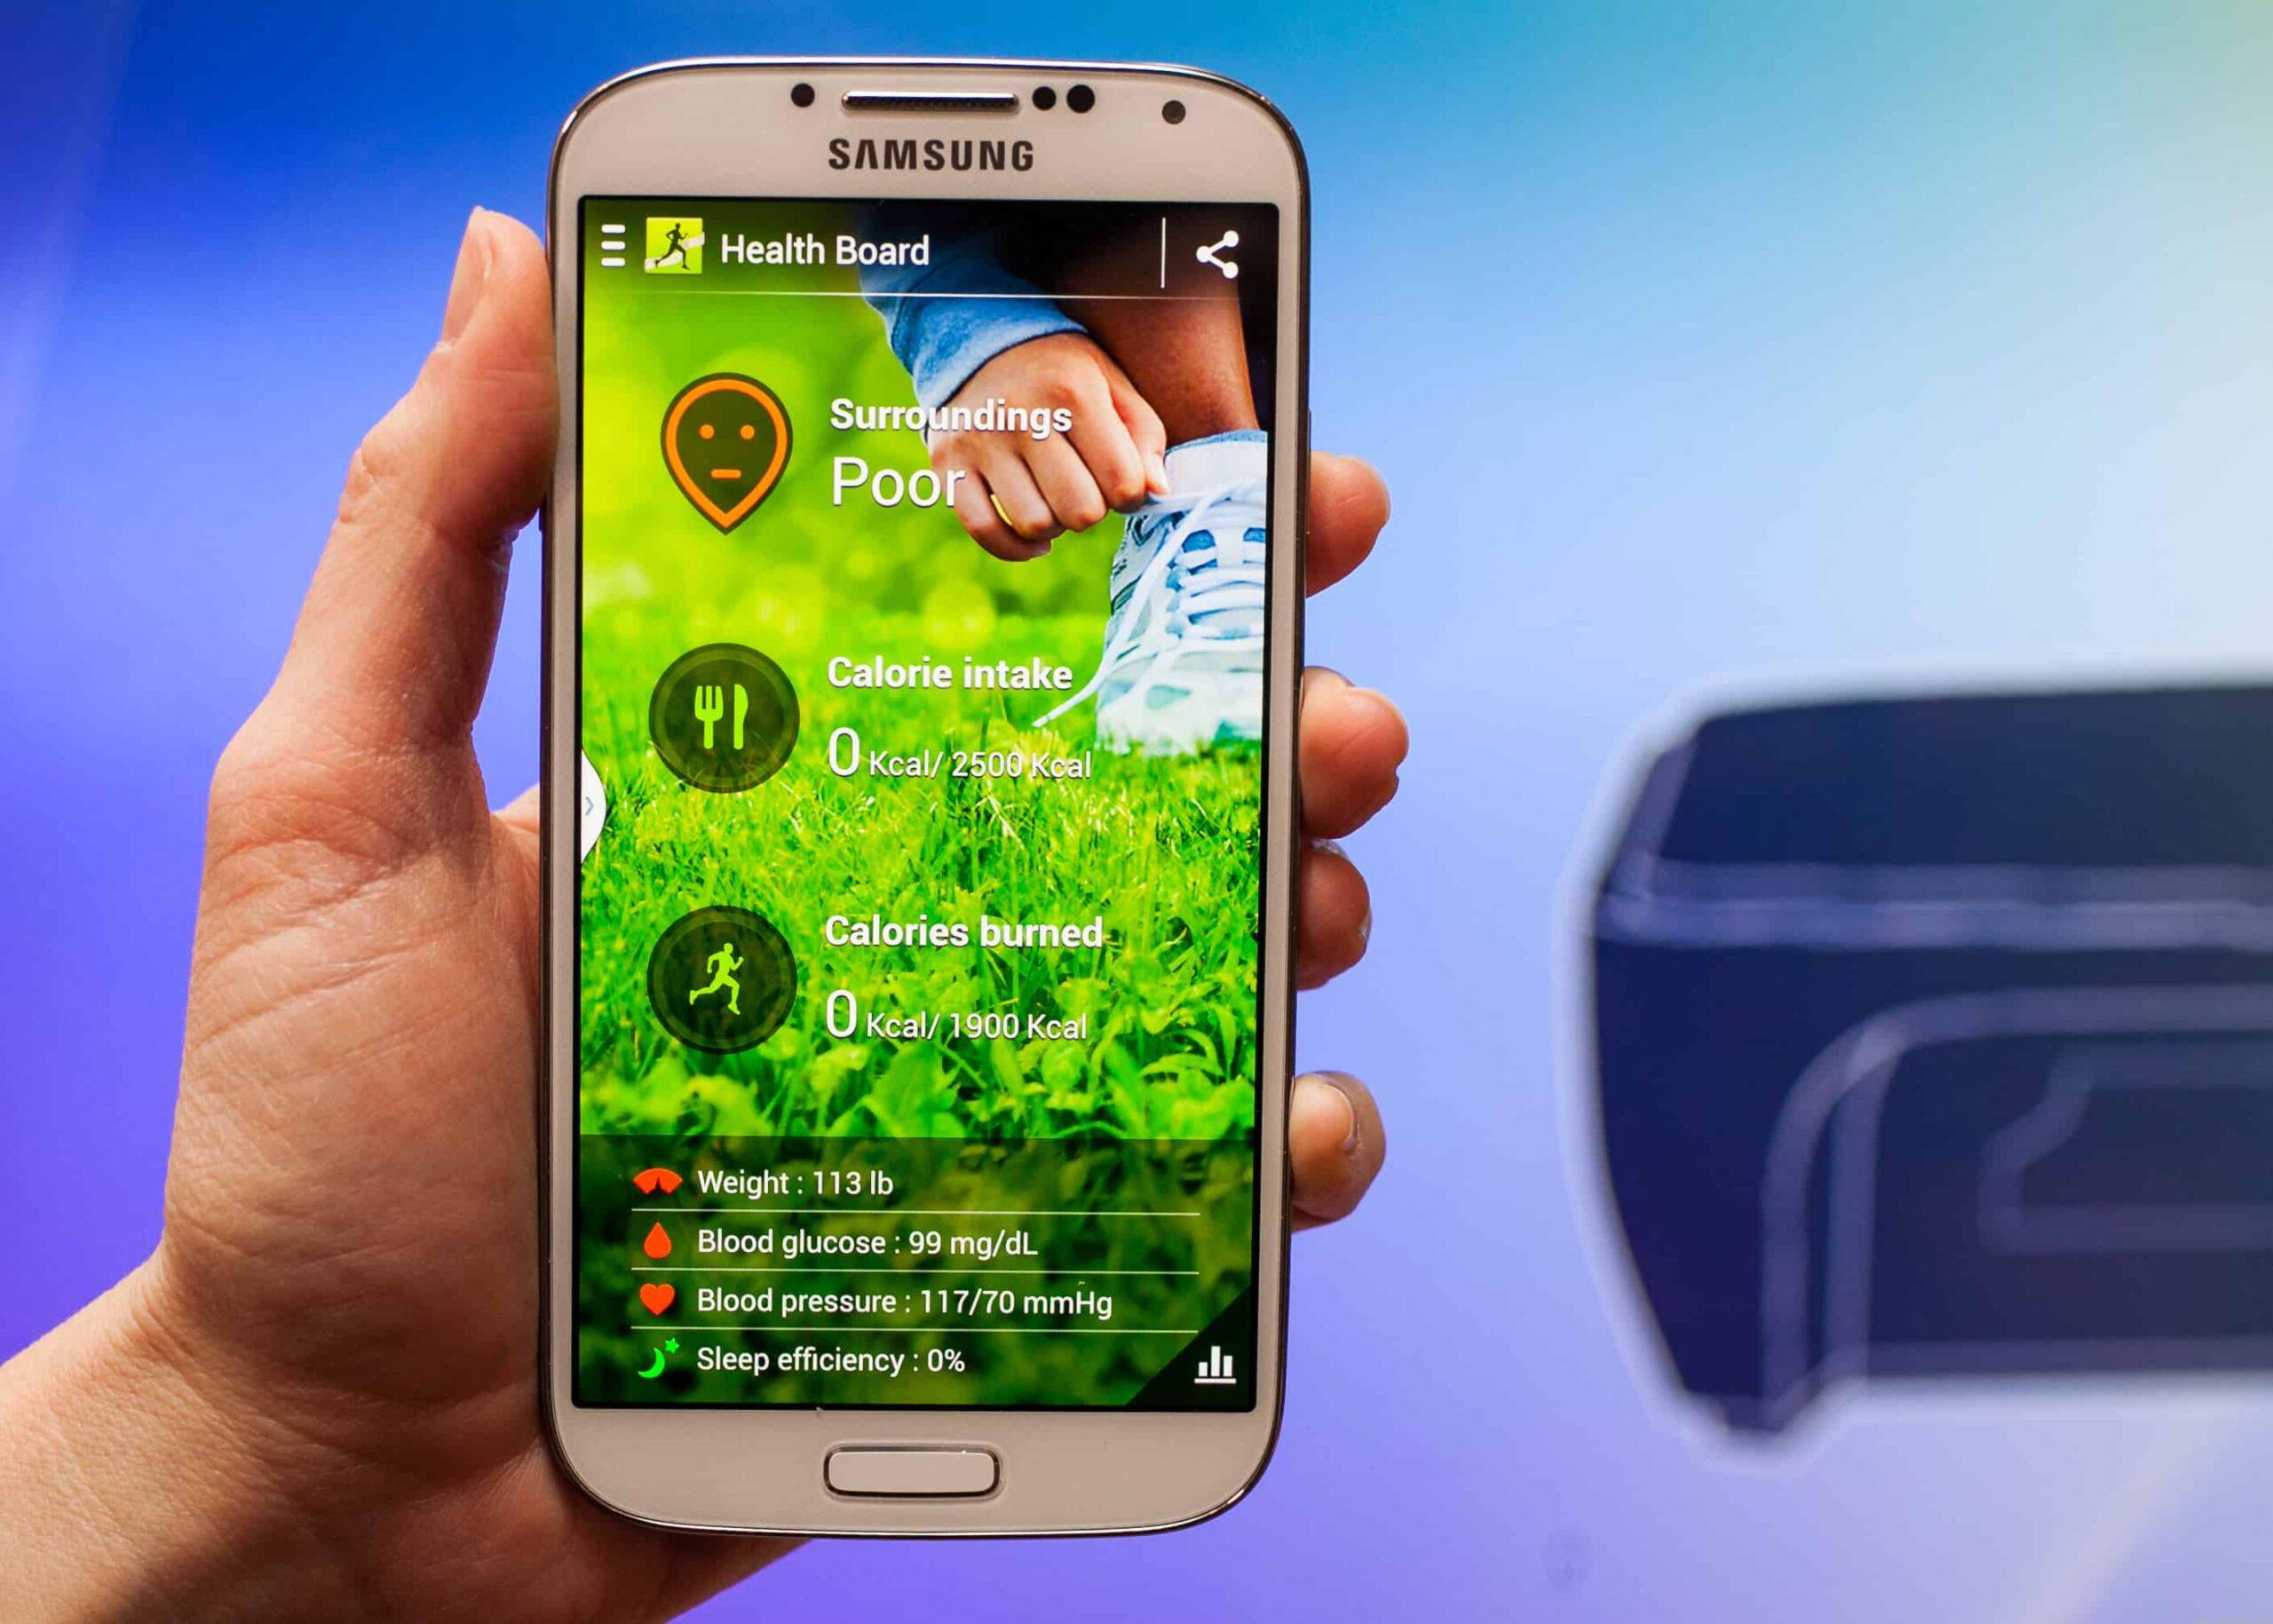 Galaxy-S4-Best-Smartphone-below-20K-INR-April-2015